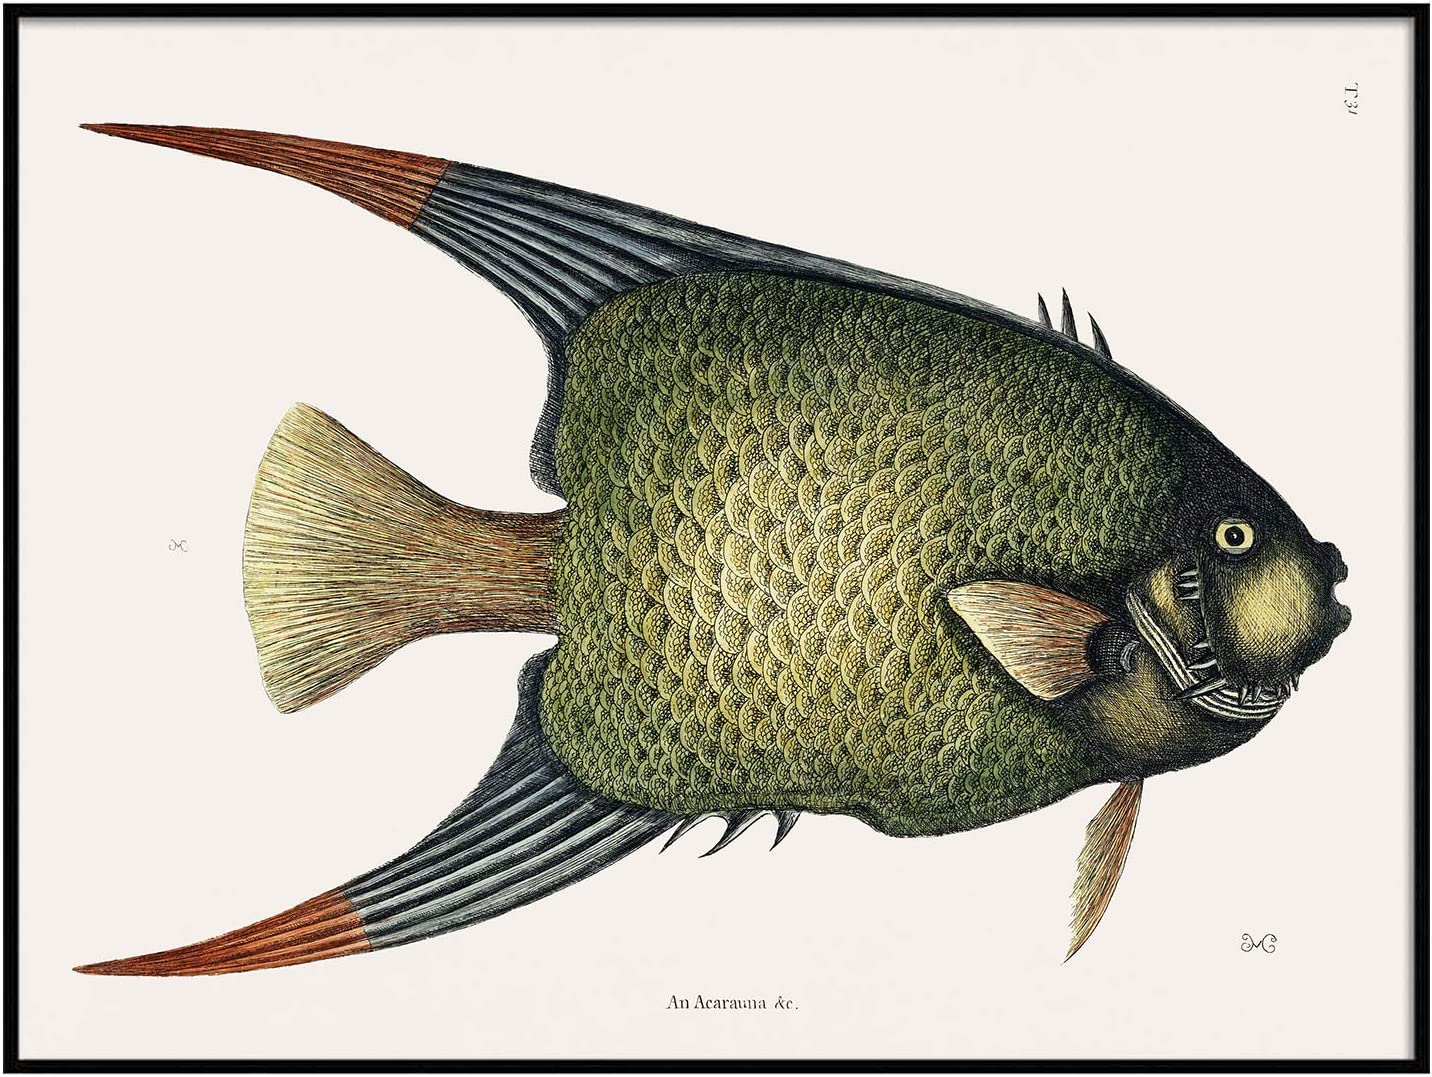 Angel Fish Antique Print Illustration, Vintage Poster, Fishing Wall Art Decor, an Acarauna, deep Water Fish, Fishing Wall Decor | C226 8.5x11